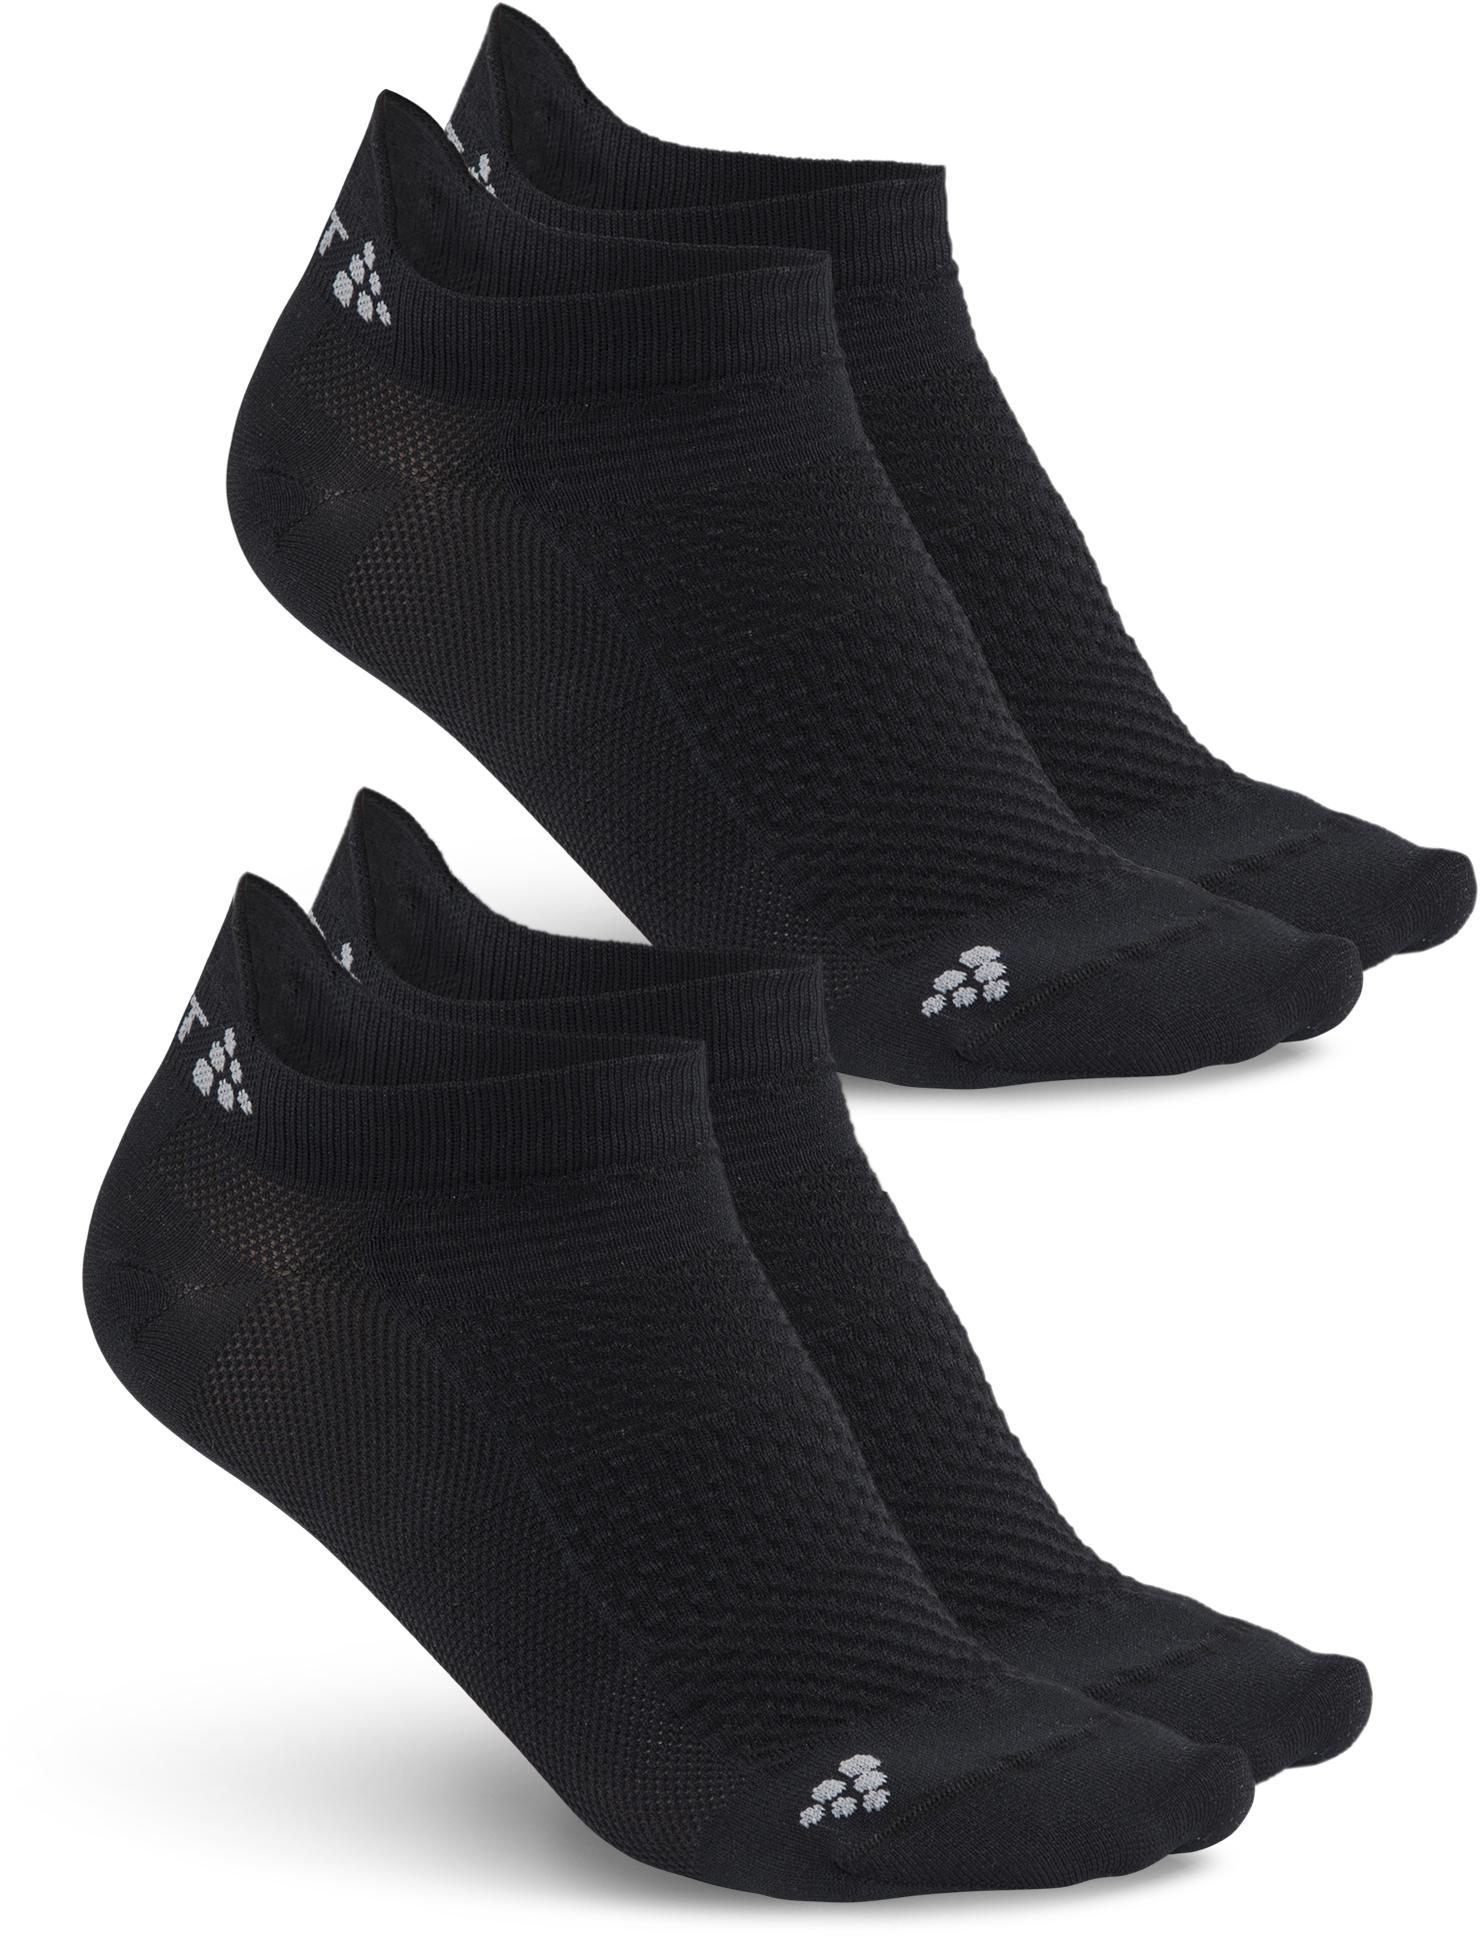 Ponožky Craft Shaftless 2-pack 1905043-9999 94689d3b95